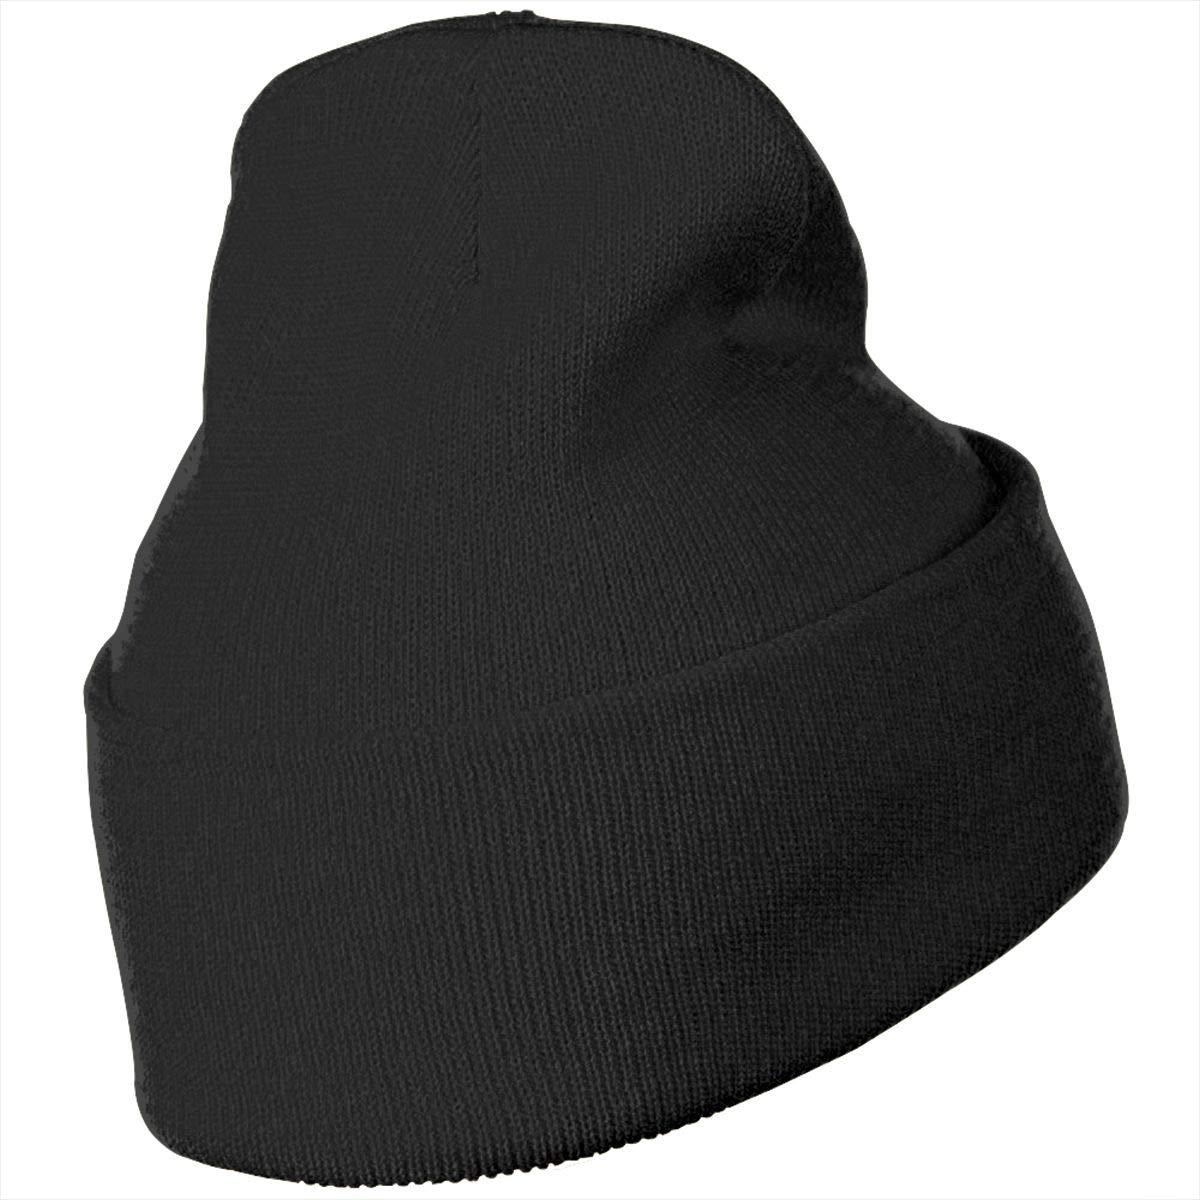 Rose Art Unisex Fashion Knitted Hat Luxury Hip-Hop Cap